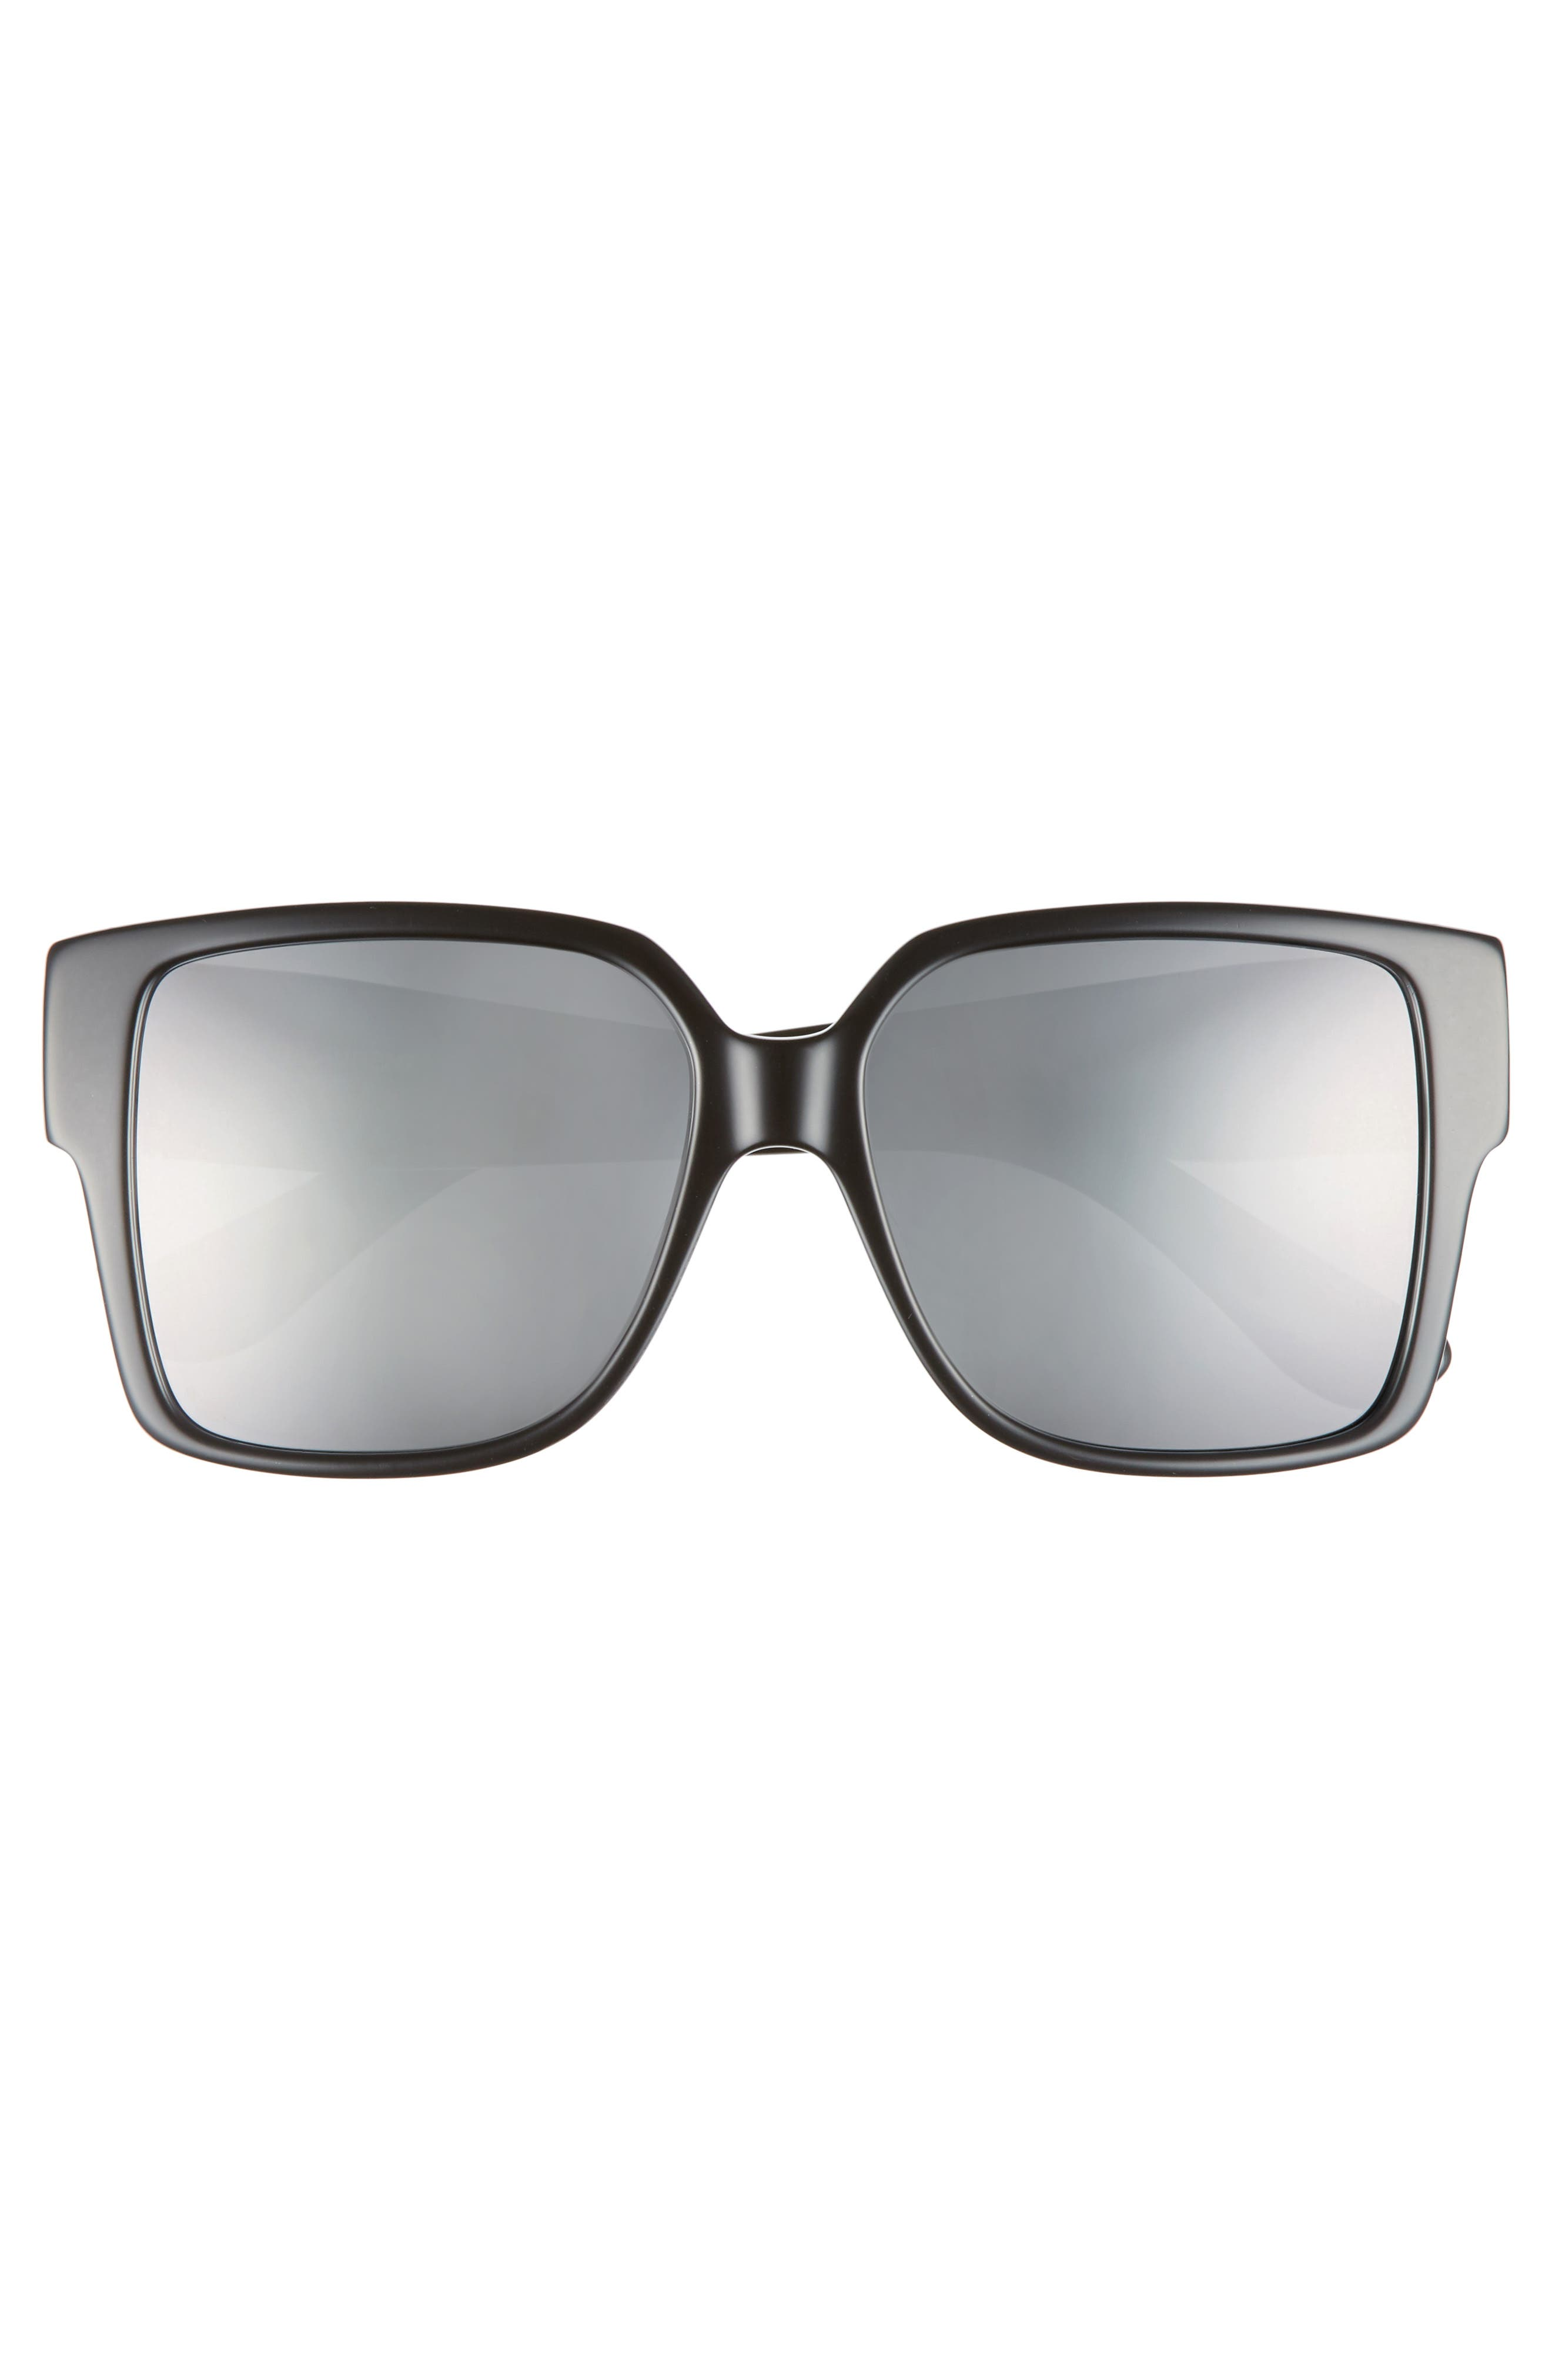 55mm Square Sunglasses,                             Alternate thumbnail 3, color,                             001